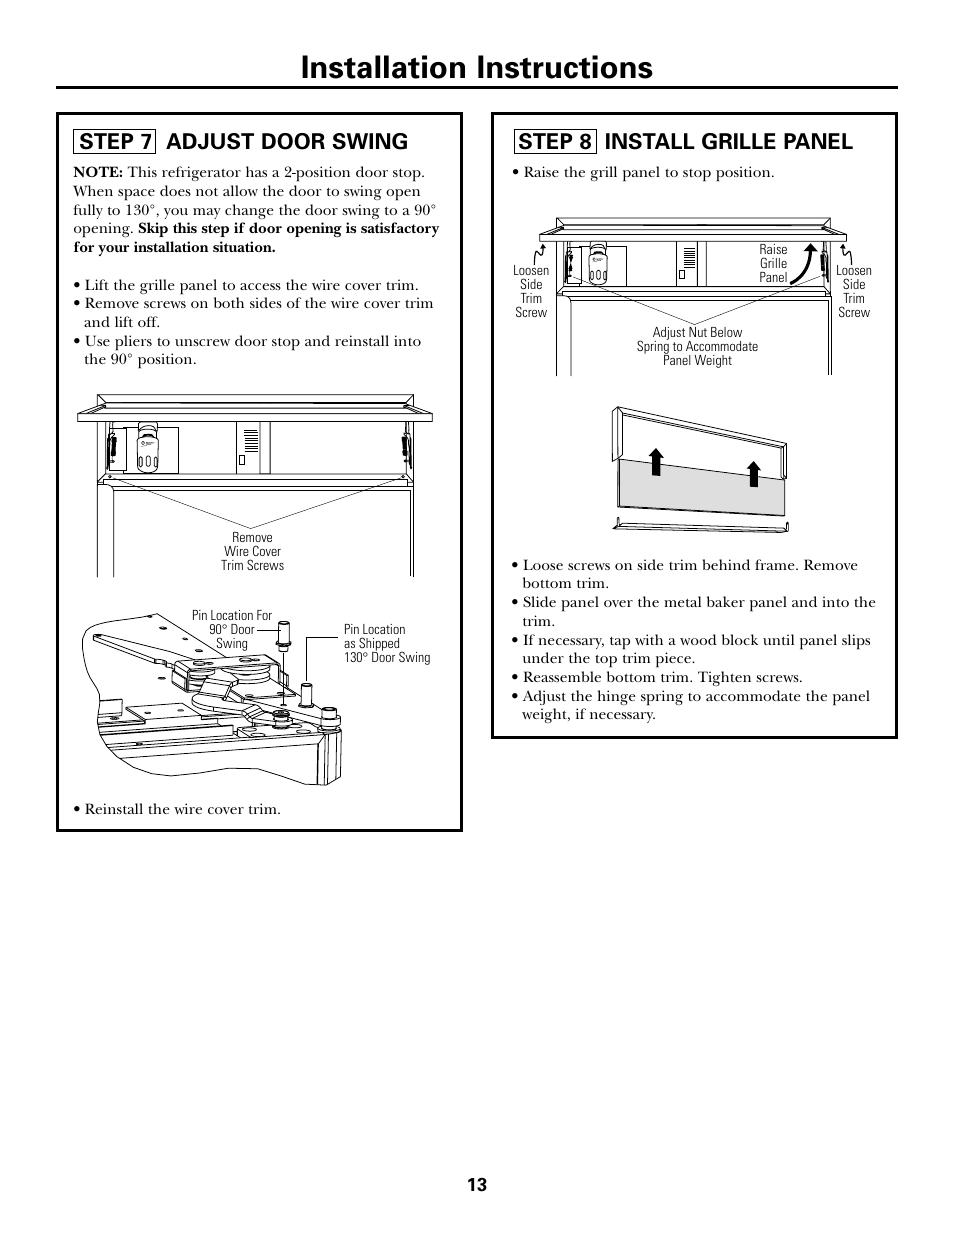 Step 7, Adjust Door Swing, Step 8, Install Grille Panel, Installation  Instructions | GE Monogram ZICS360 LH User Manual | Page 13 / 20